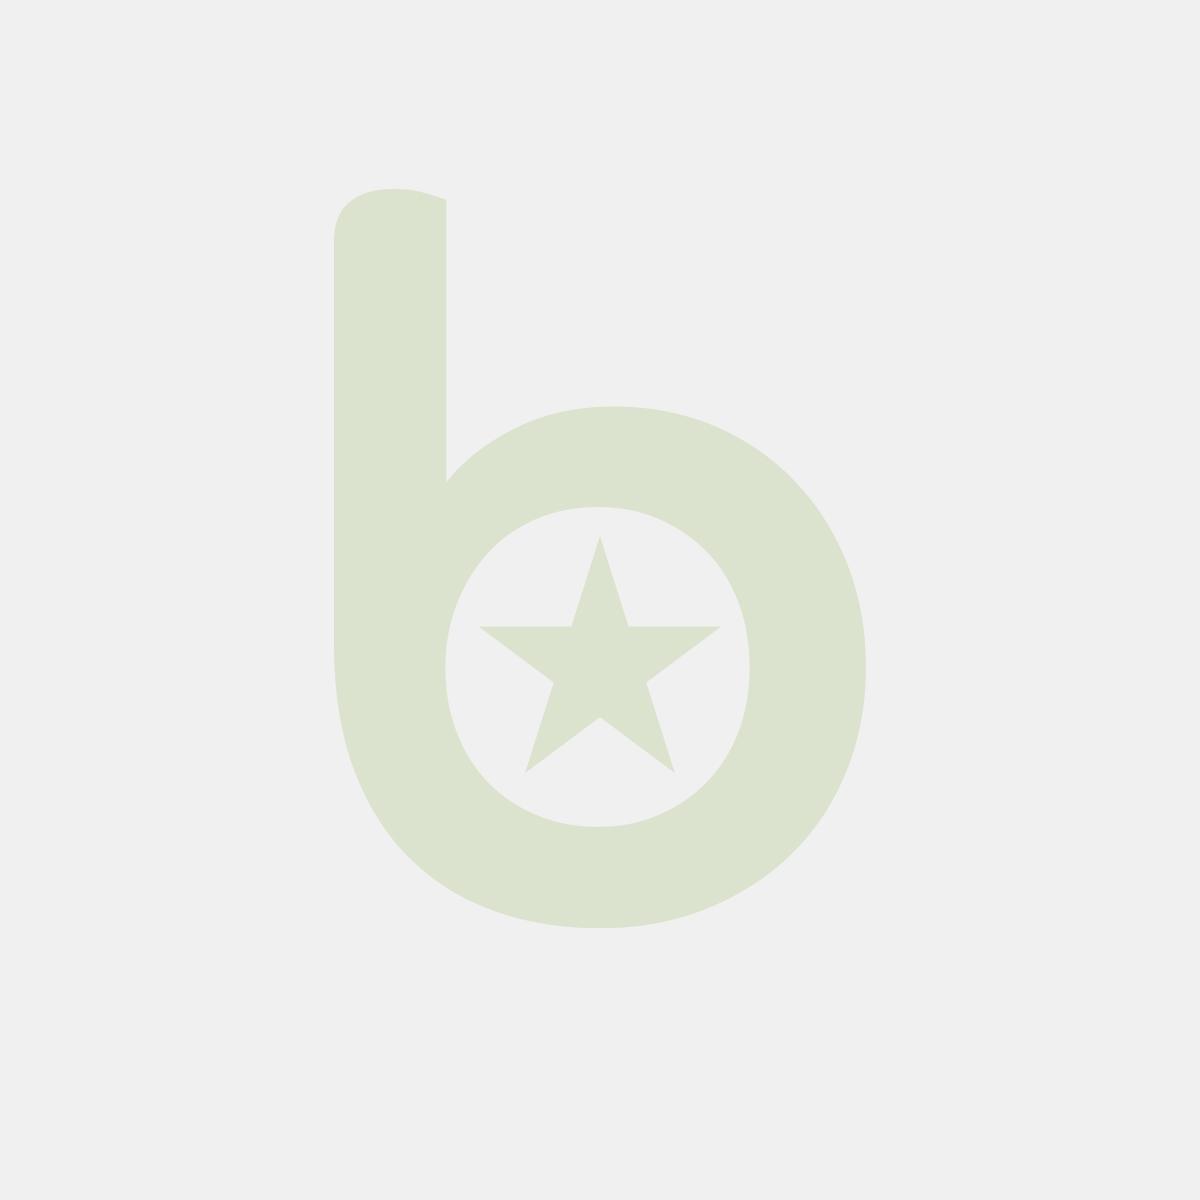 Bieżnik PAPSTAR Royal Collection w rolce 24m/40cm Burgundy Róże